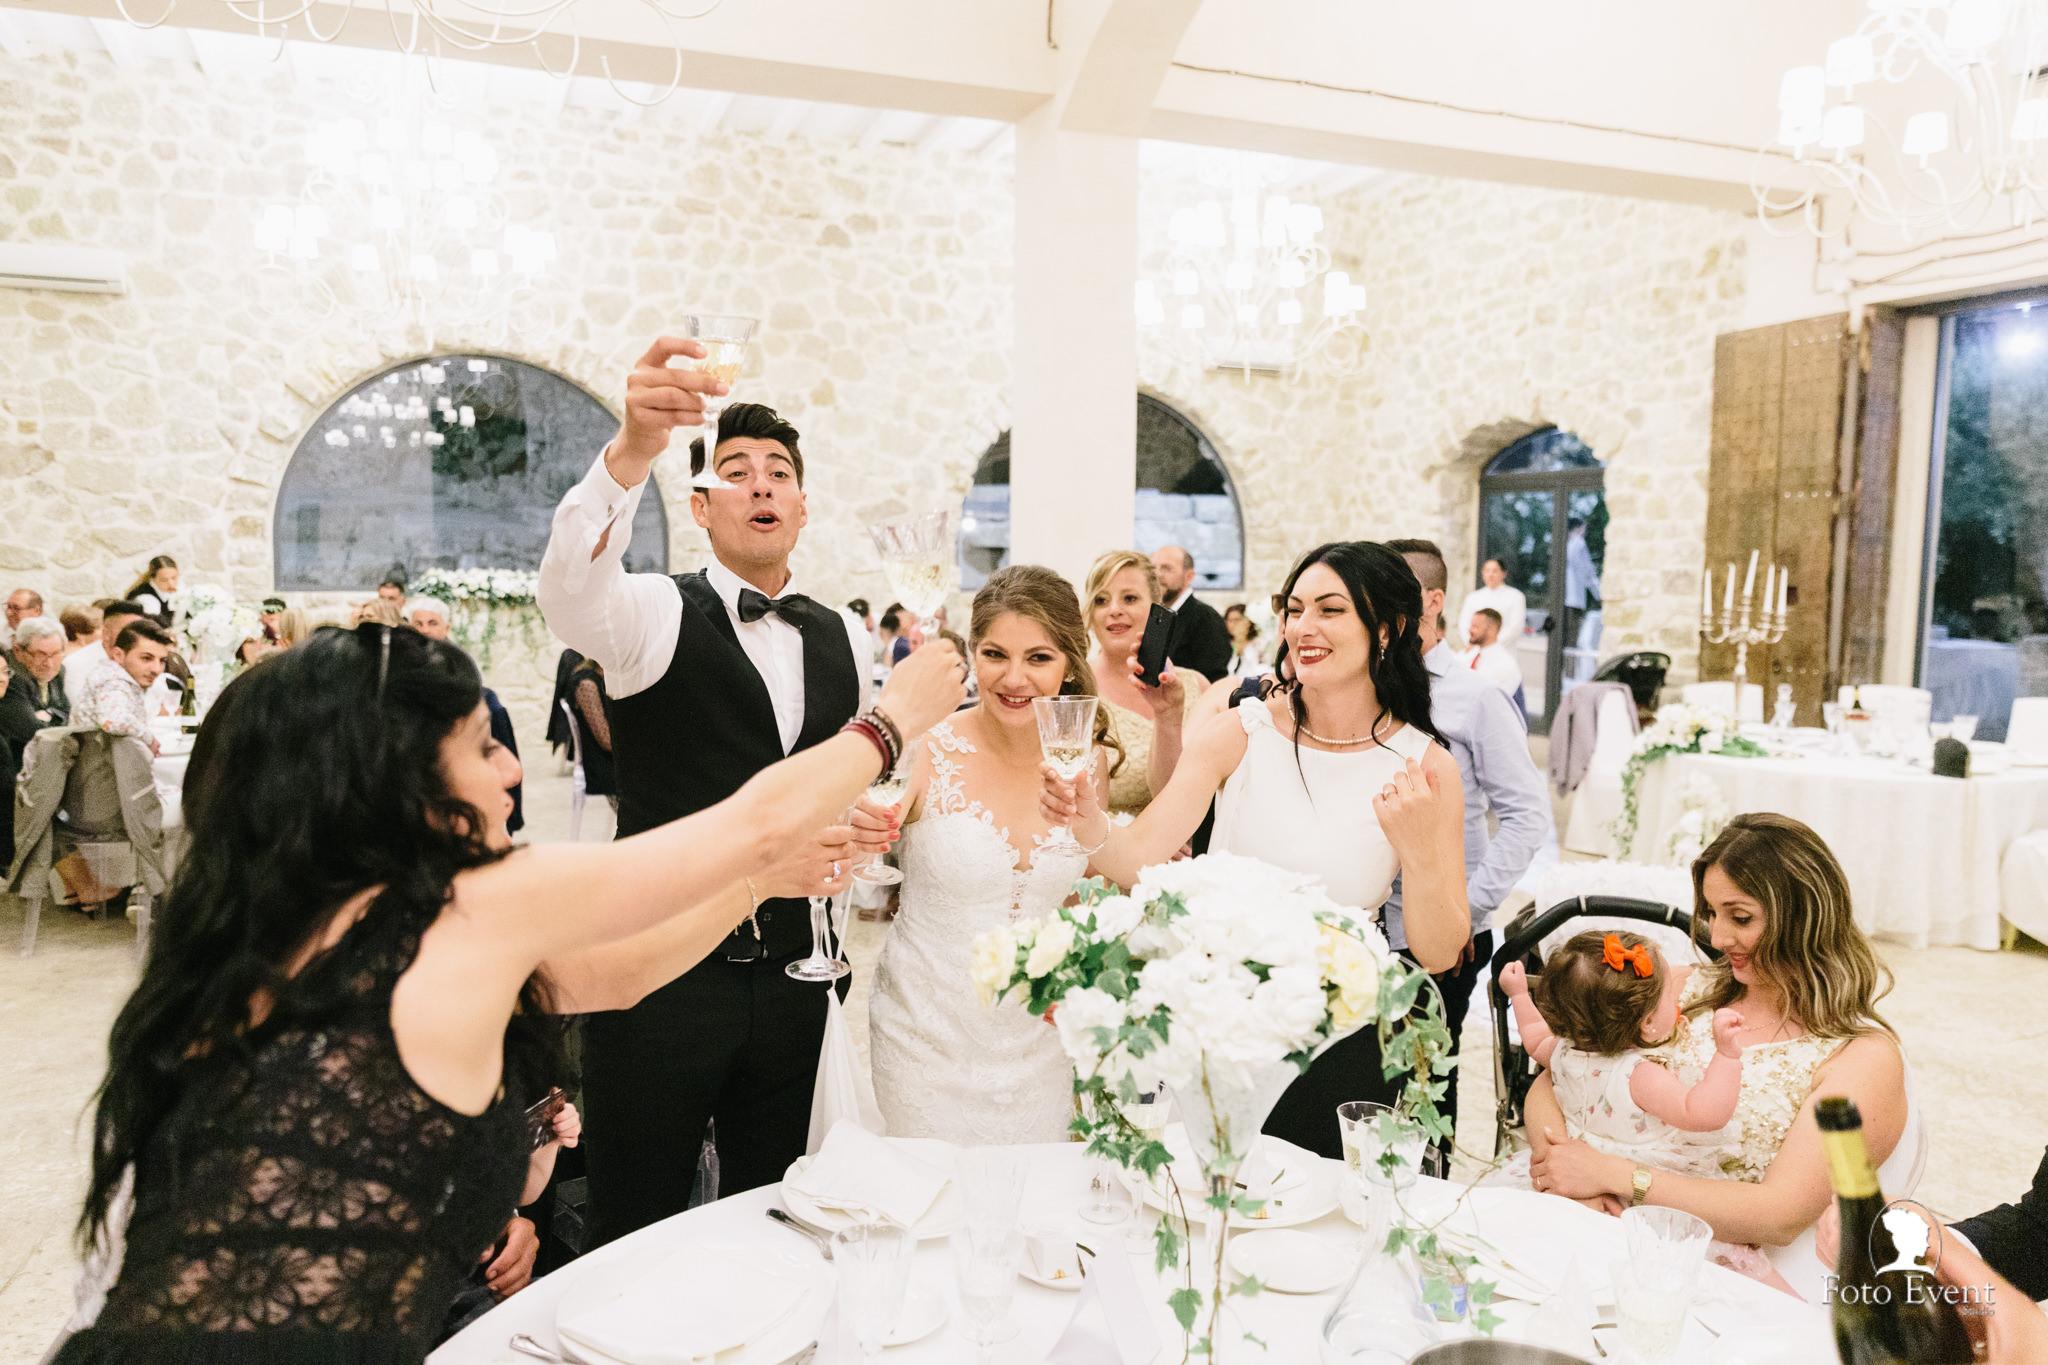 041-2019-06-12-Matrimonio-Rosa-e-Angelo-Ripellino-5DE-1432